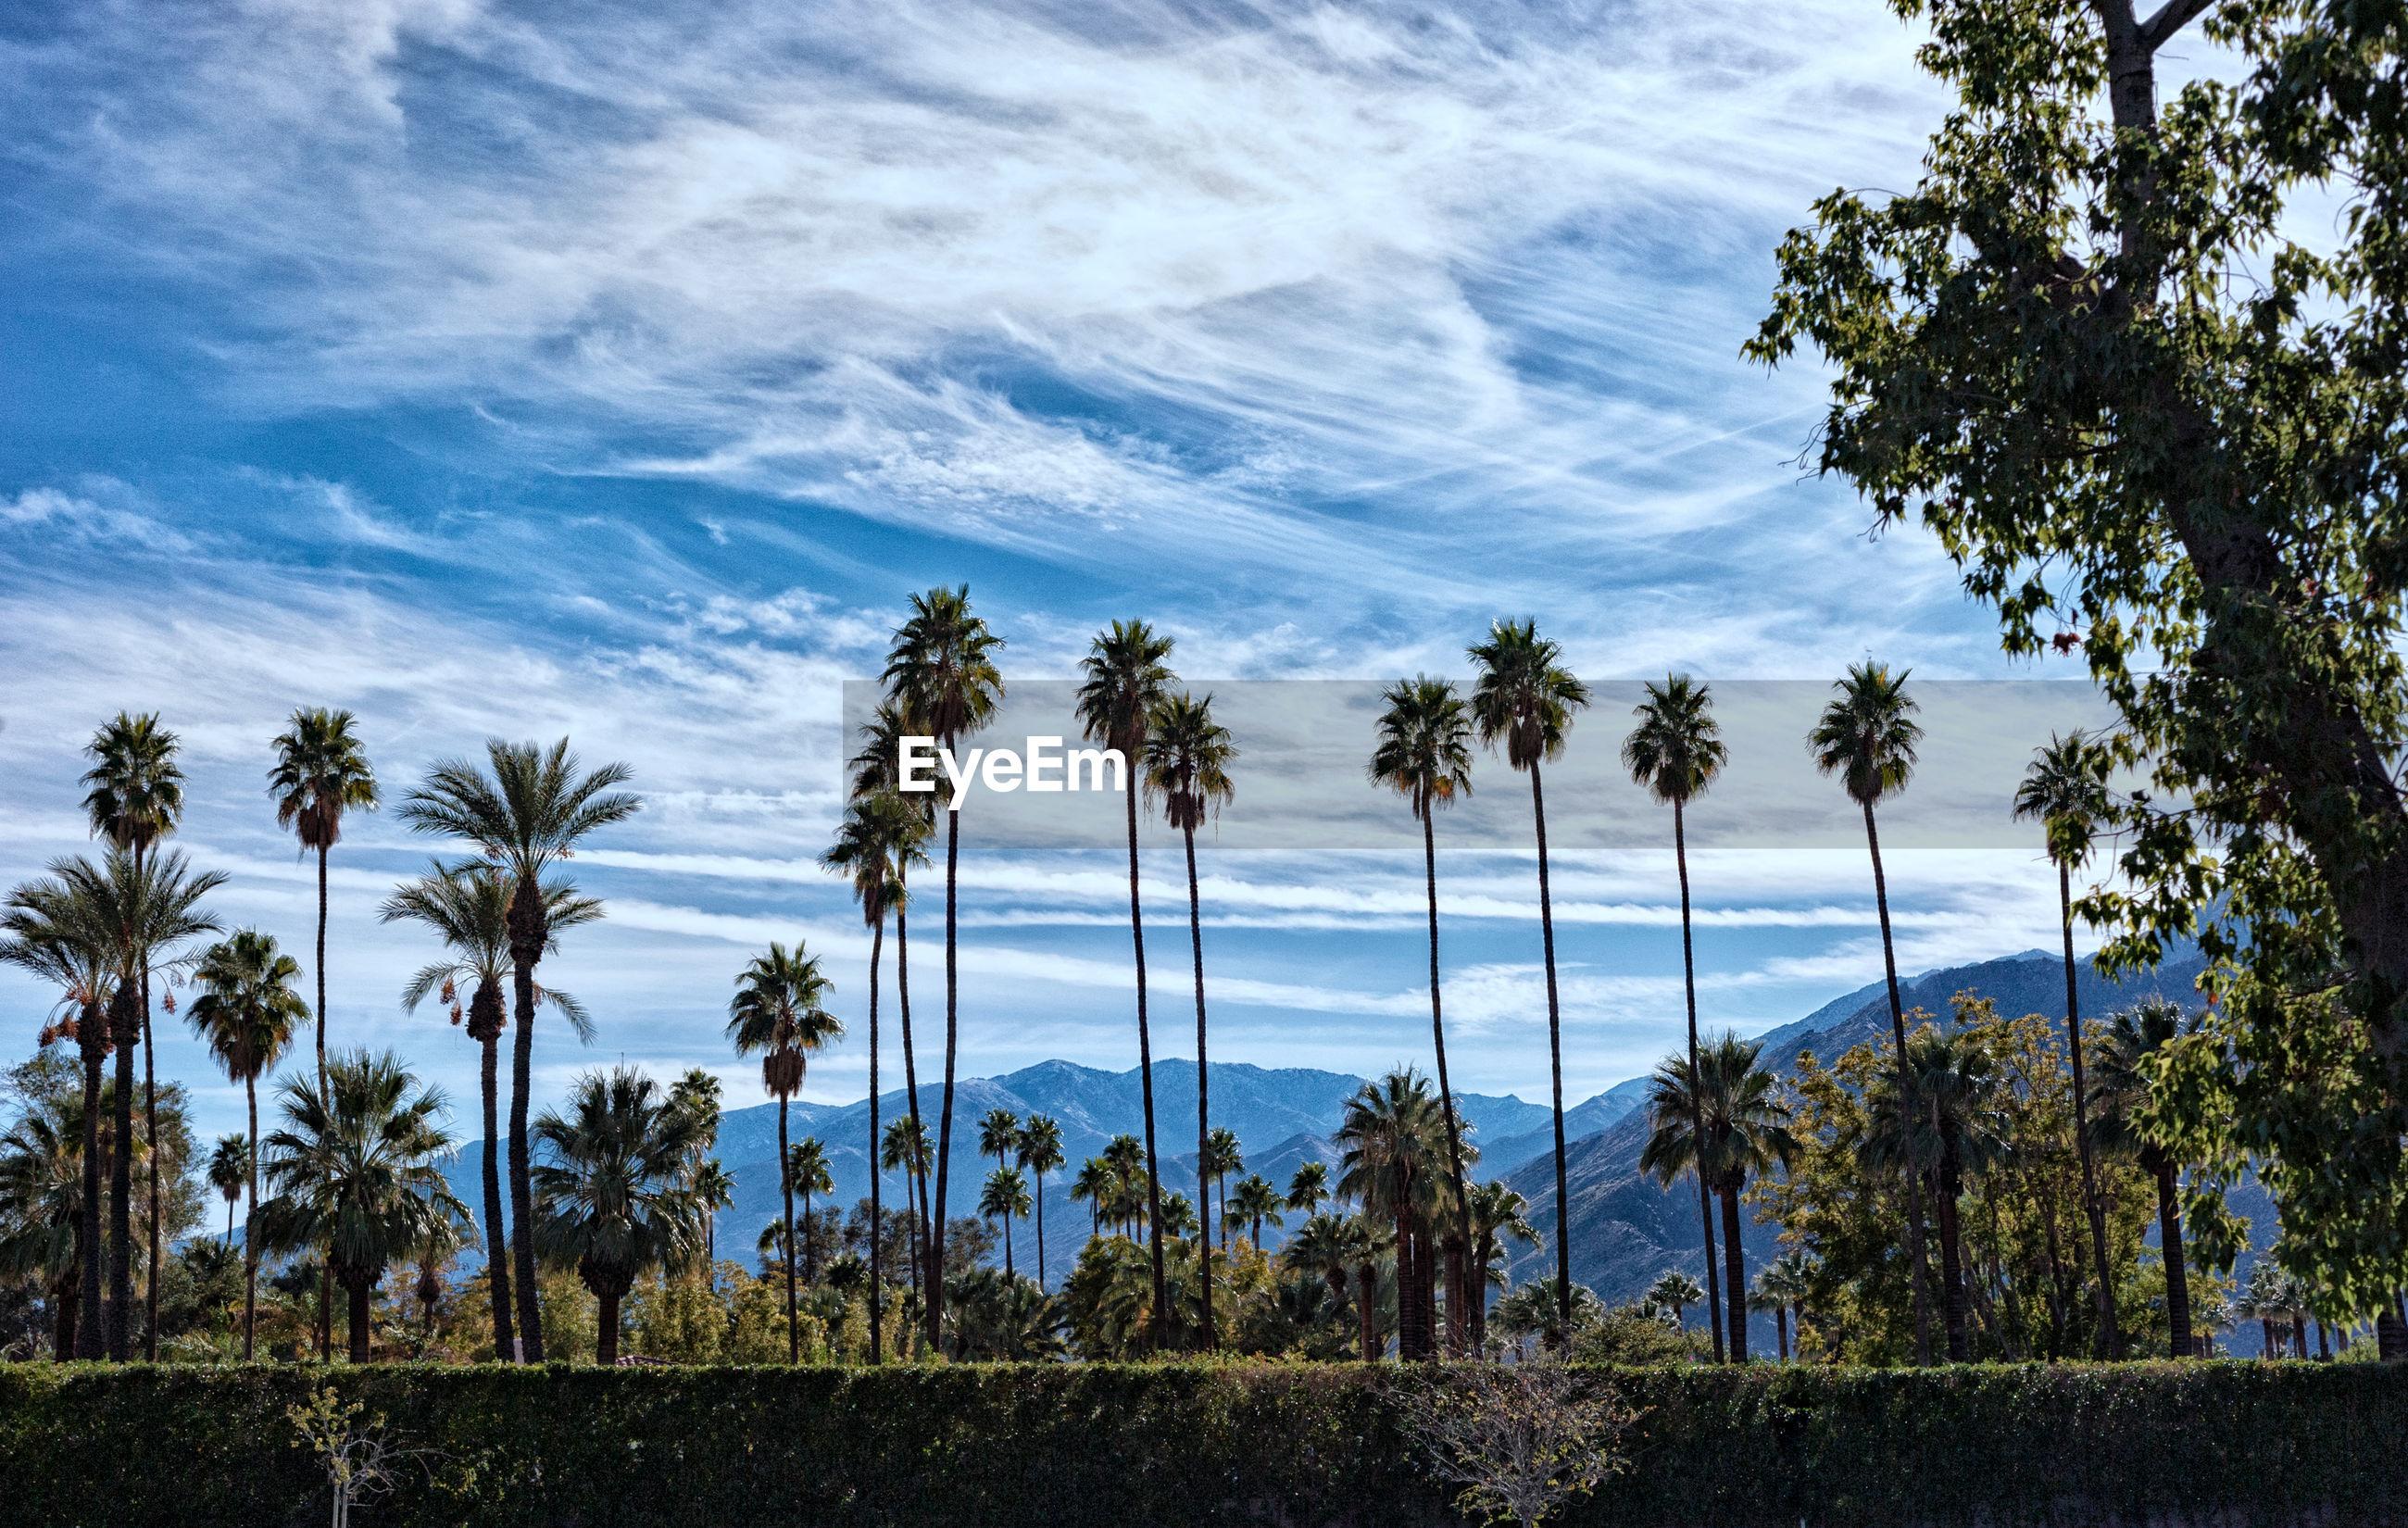 PALM TREES AGAINST BLUE SEA